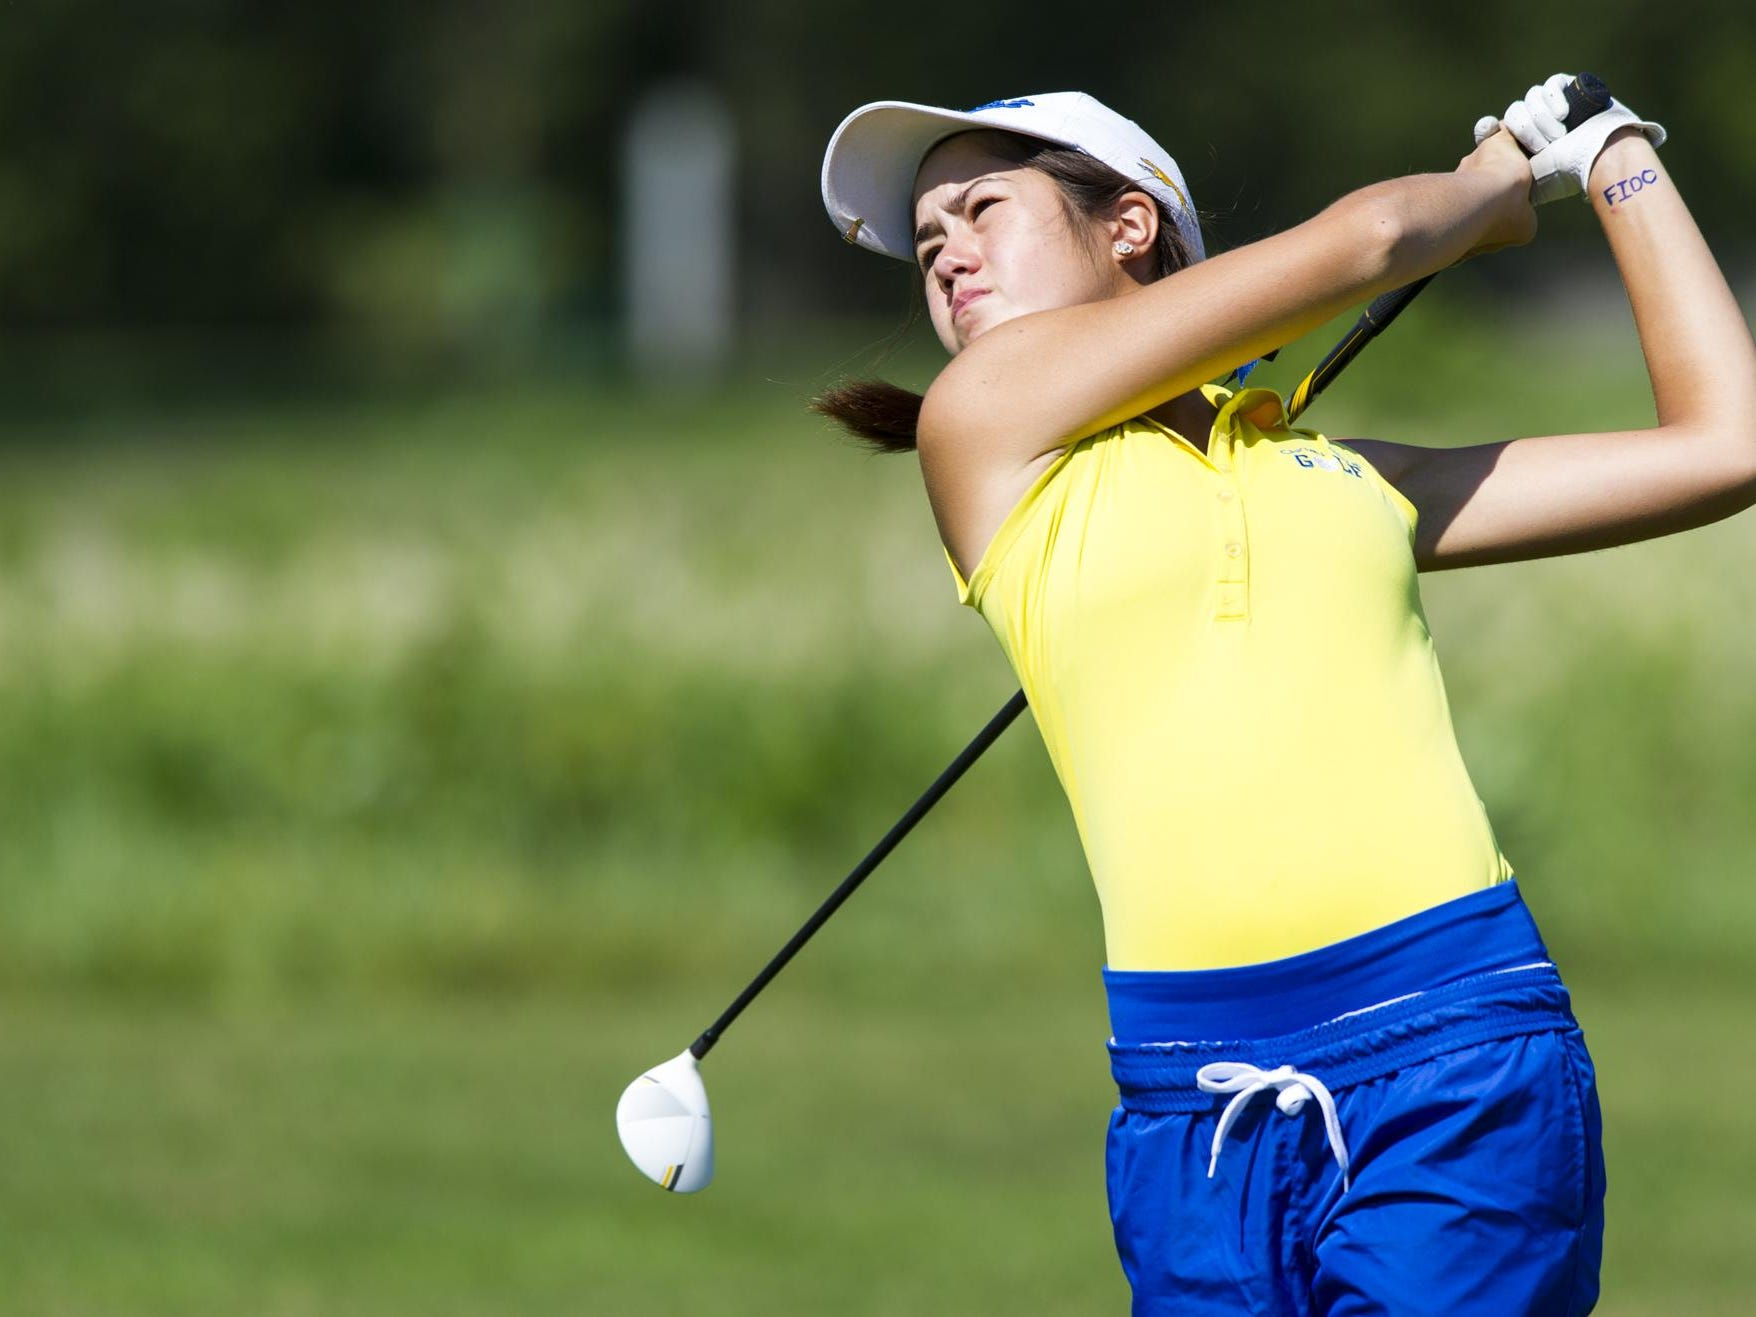 Carmel's Makenzie George shown in 2014 IHSAA Girls Golf Sectionals.